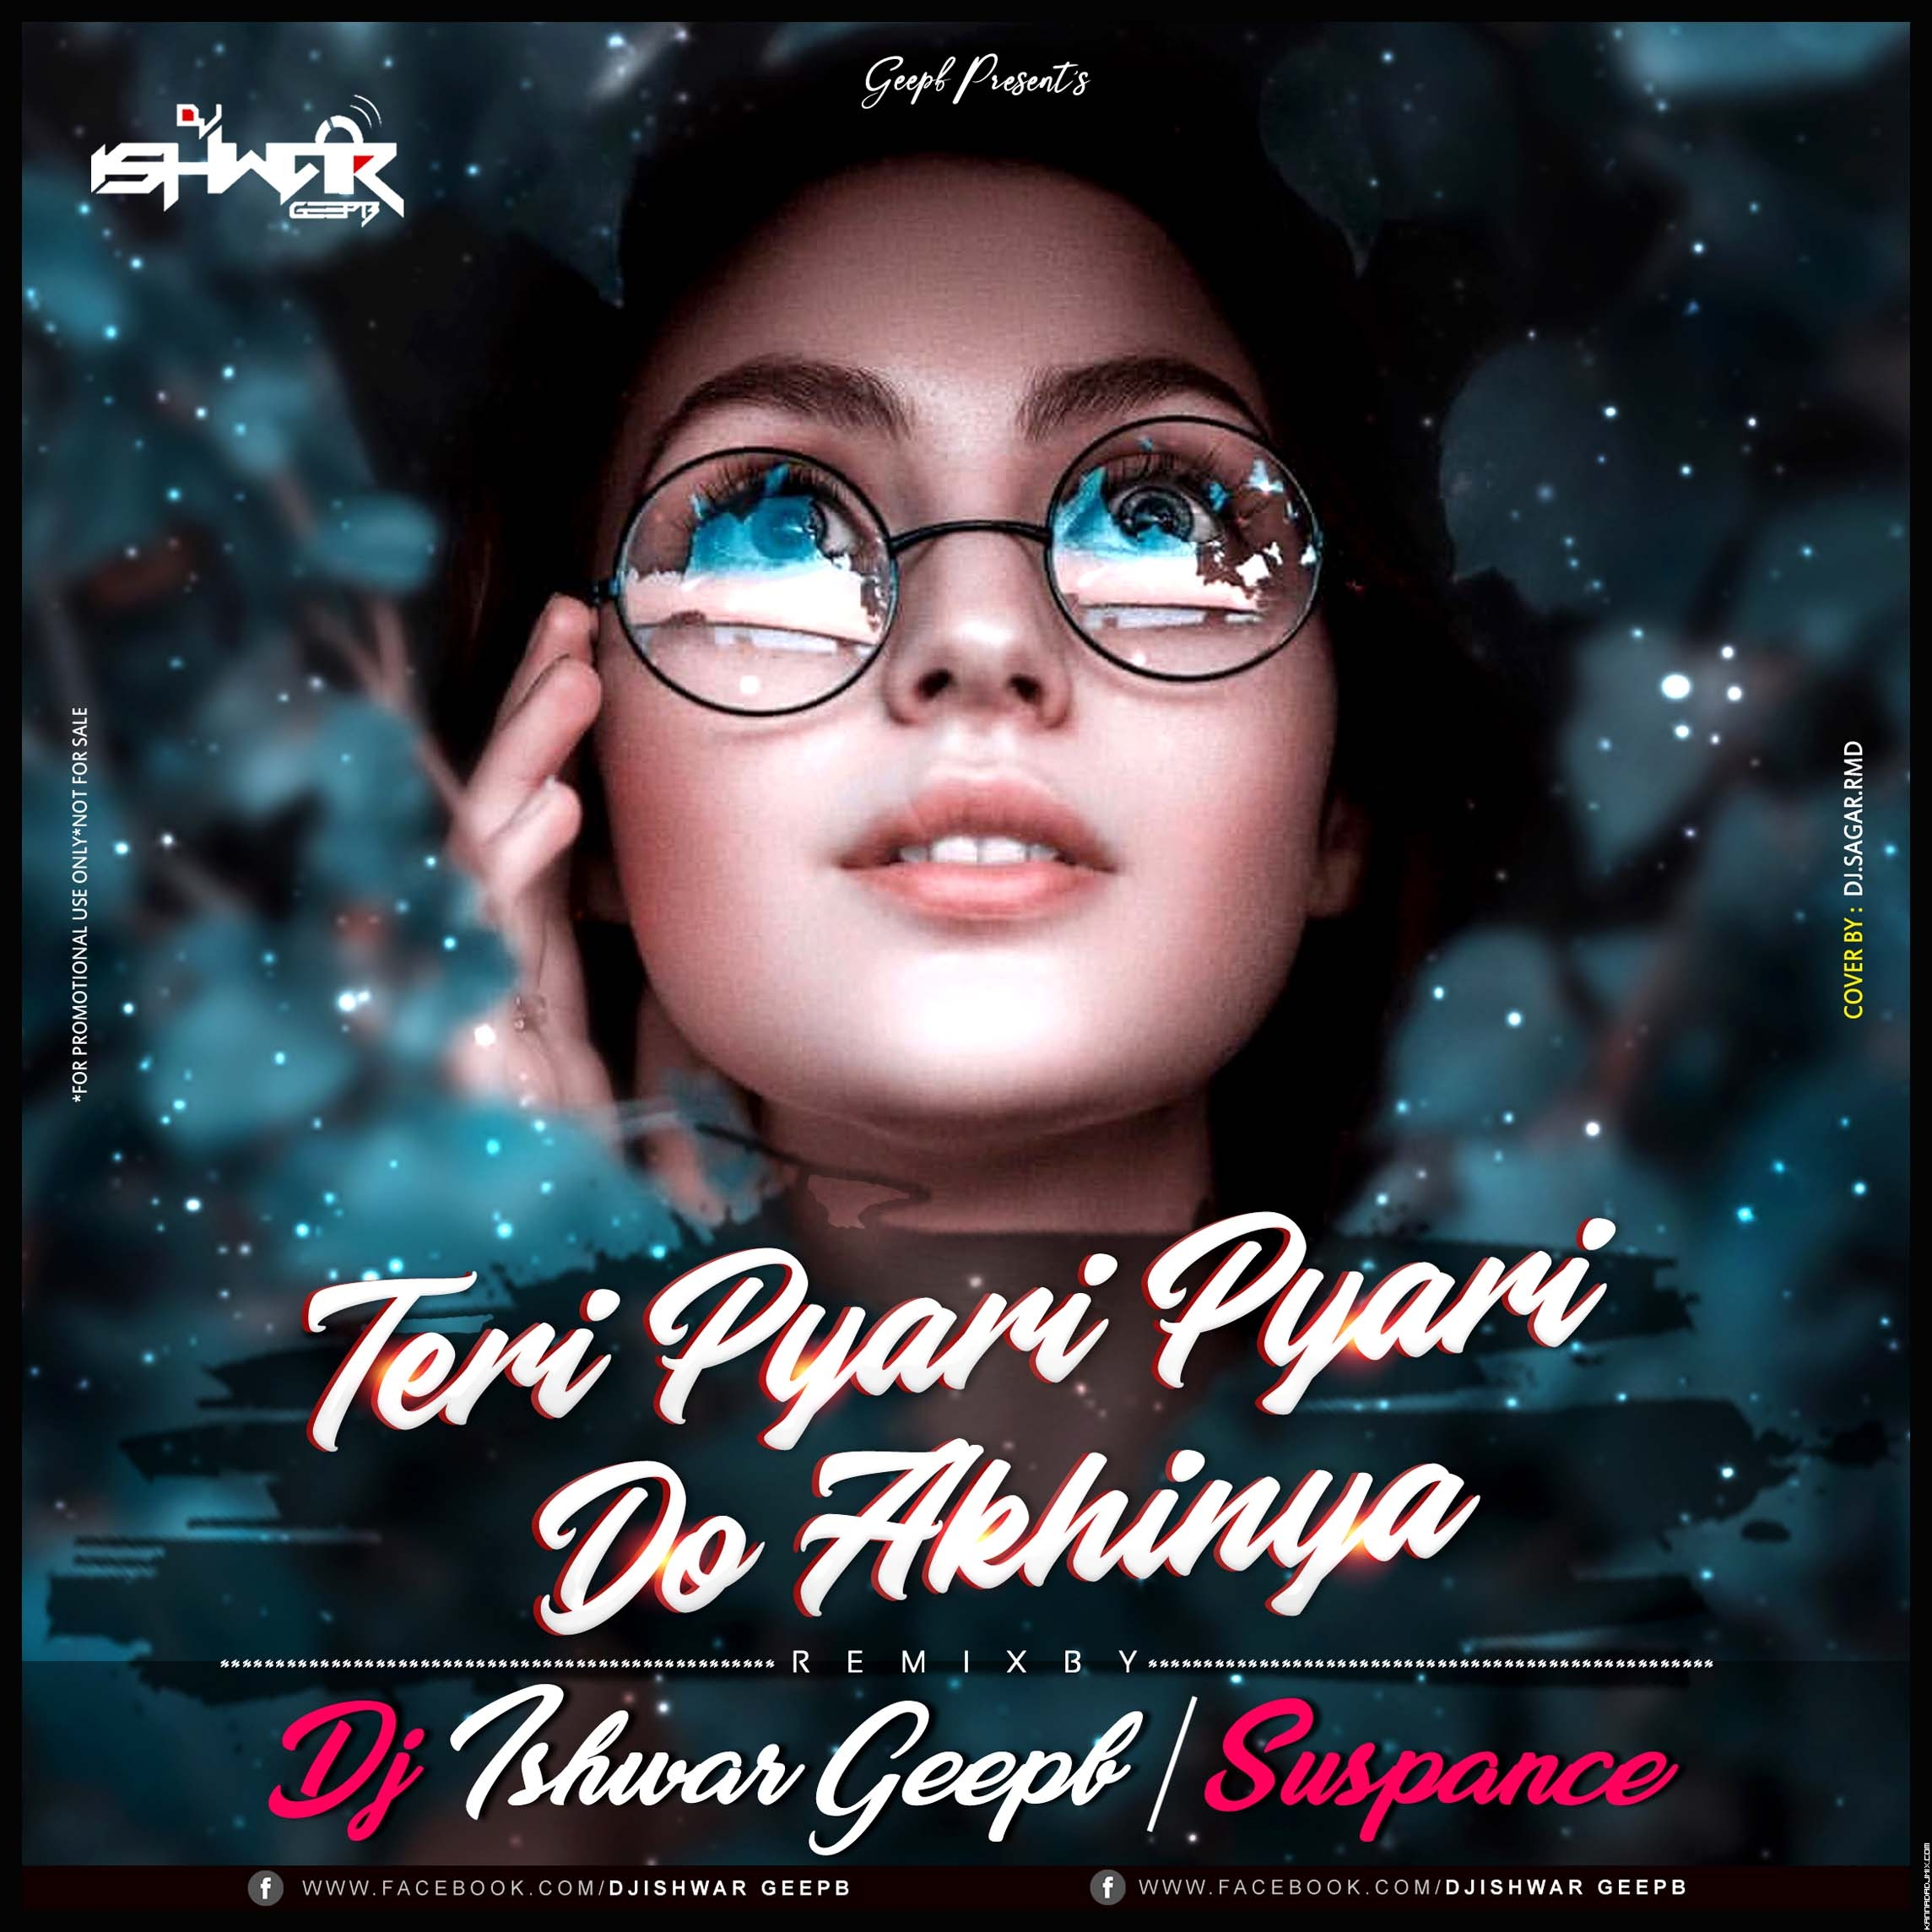 01 TERI PYARI PYARI DO AKIYA REMIXD DJ ISHWAR GeePB & SUSPENCE.mp3